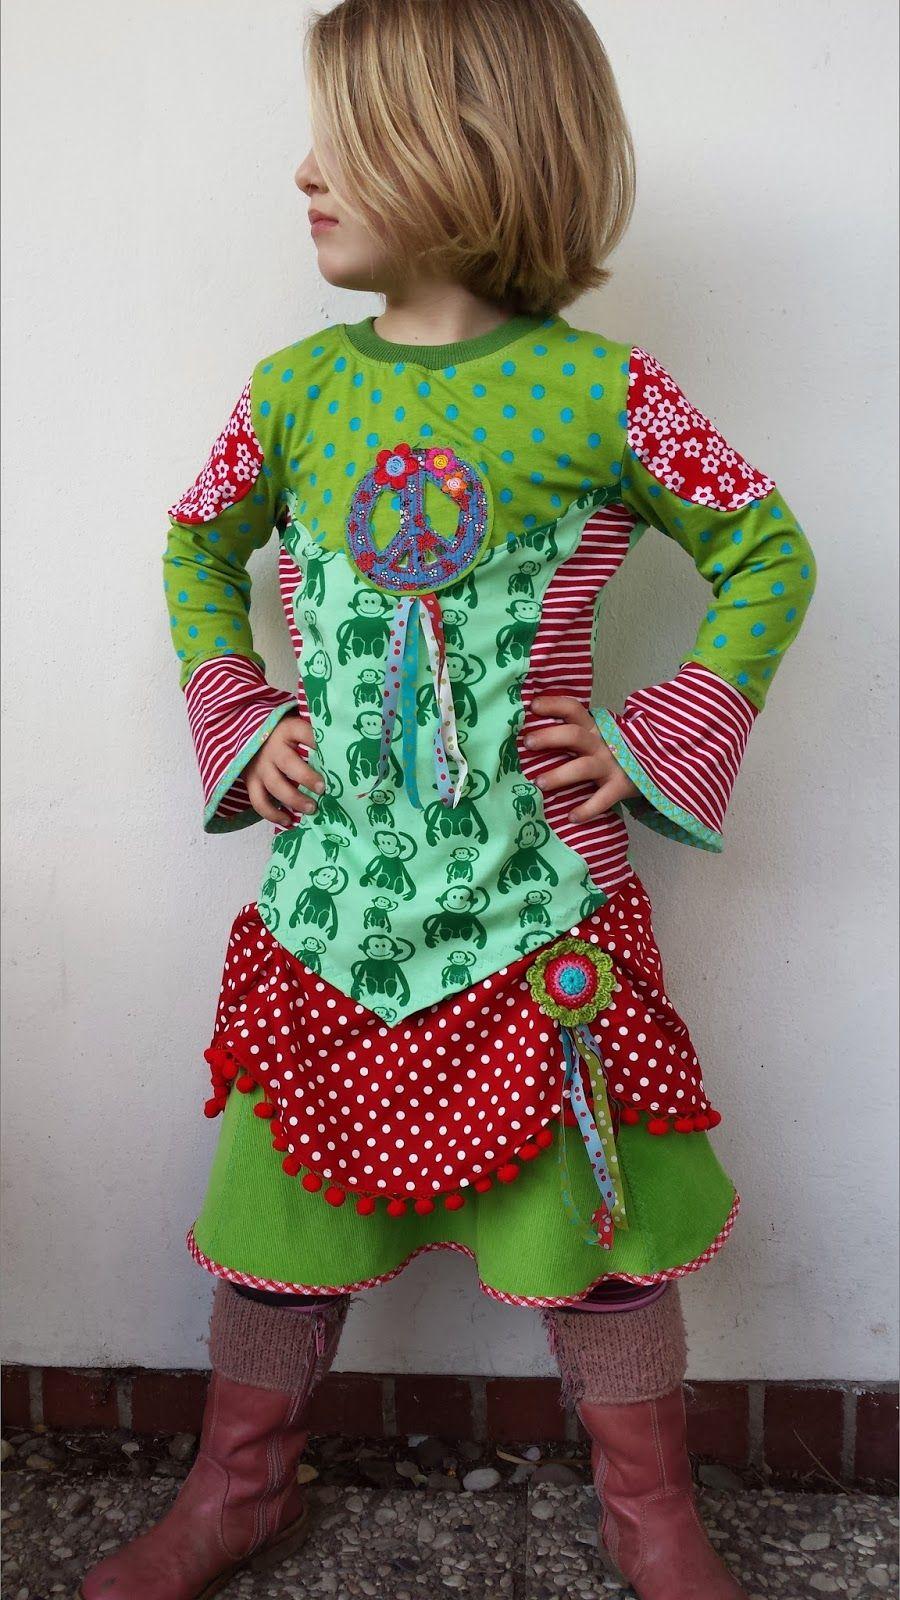 HippMe Janeas World & Insa Farbenmix #babykidclothesandideas